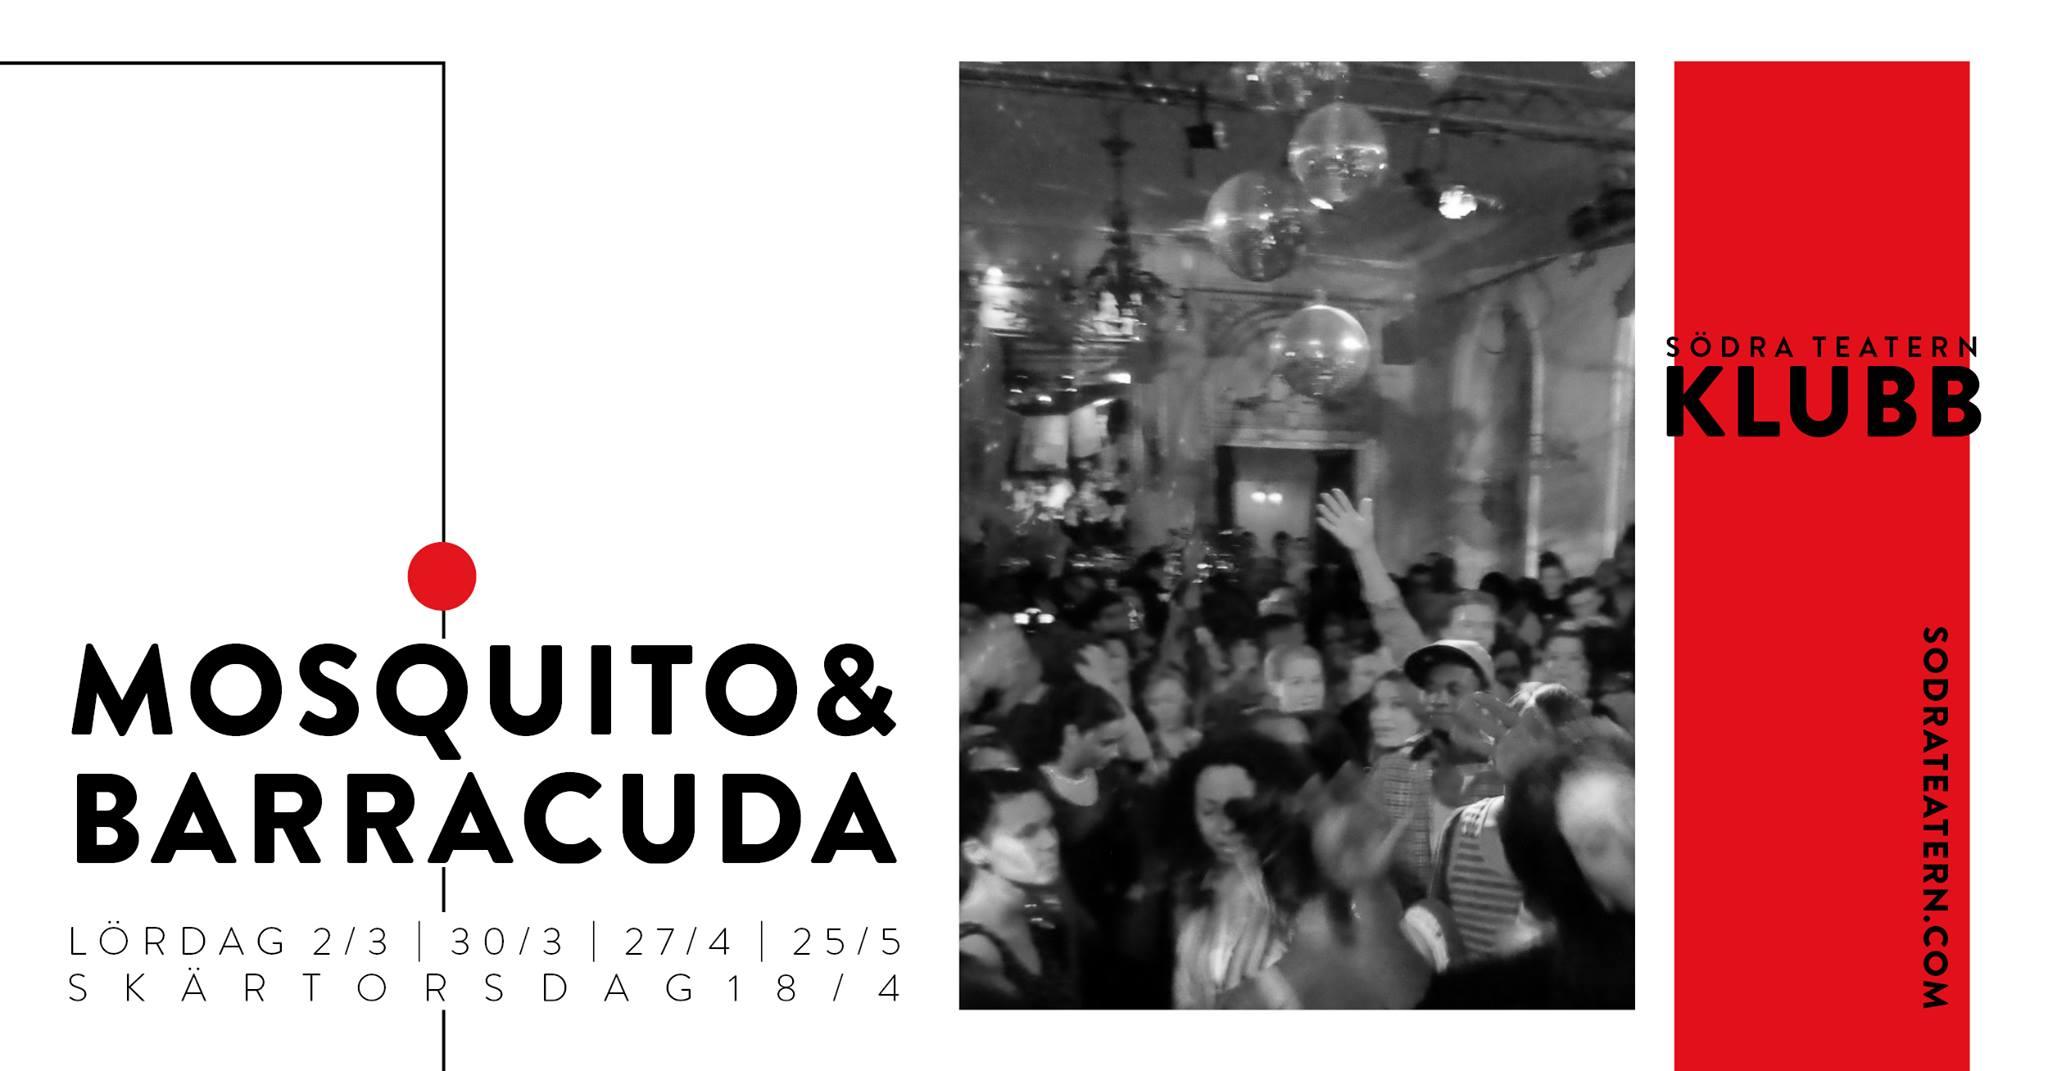 Klubb: Mosquito & Barracuda på Södra teatern!